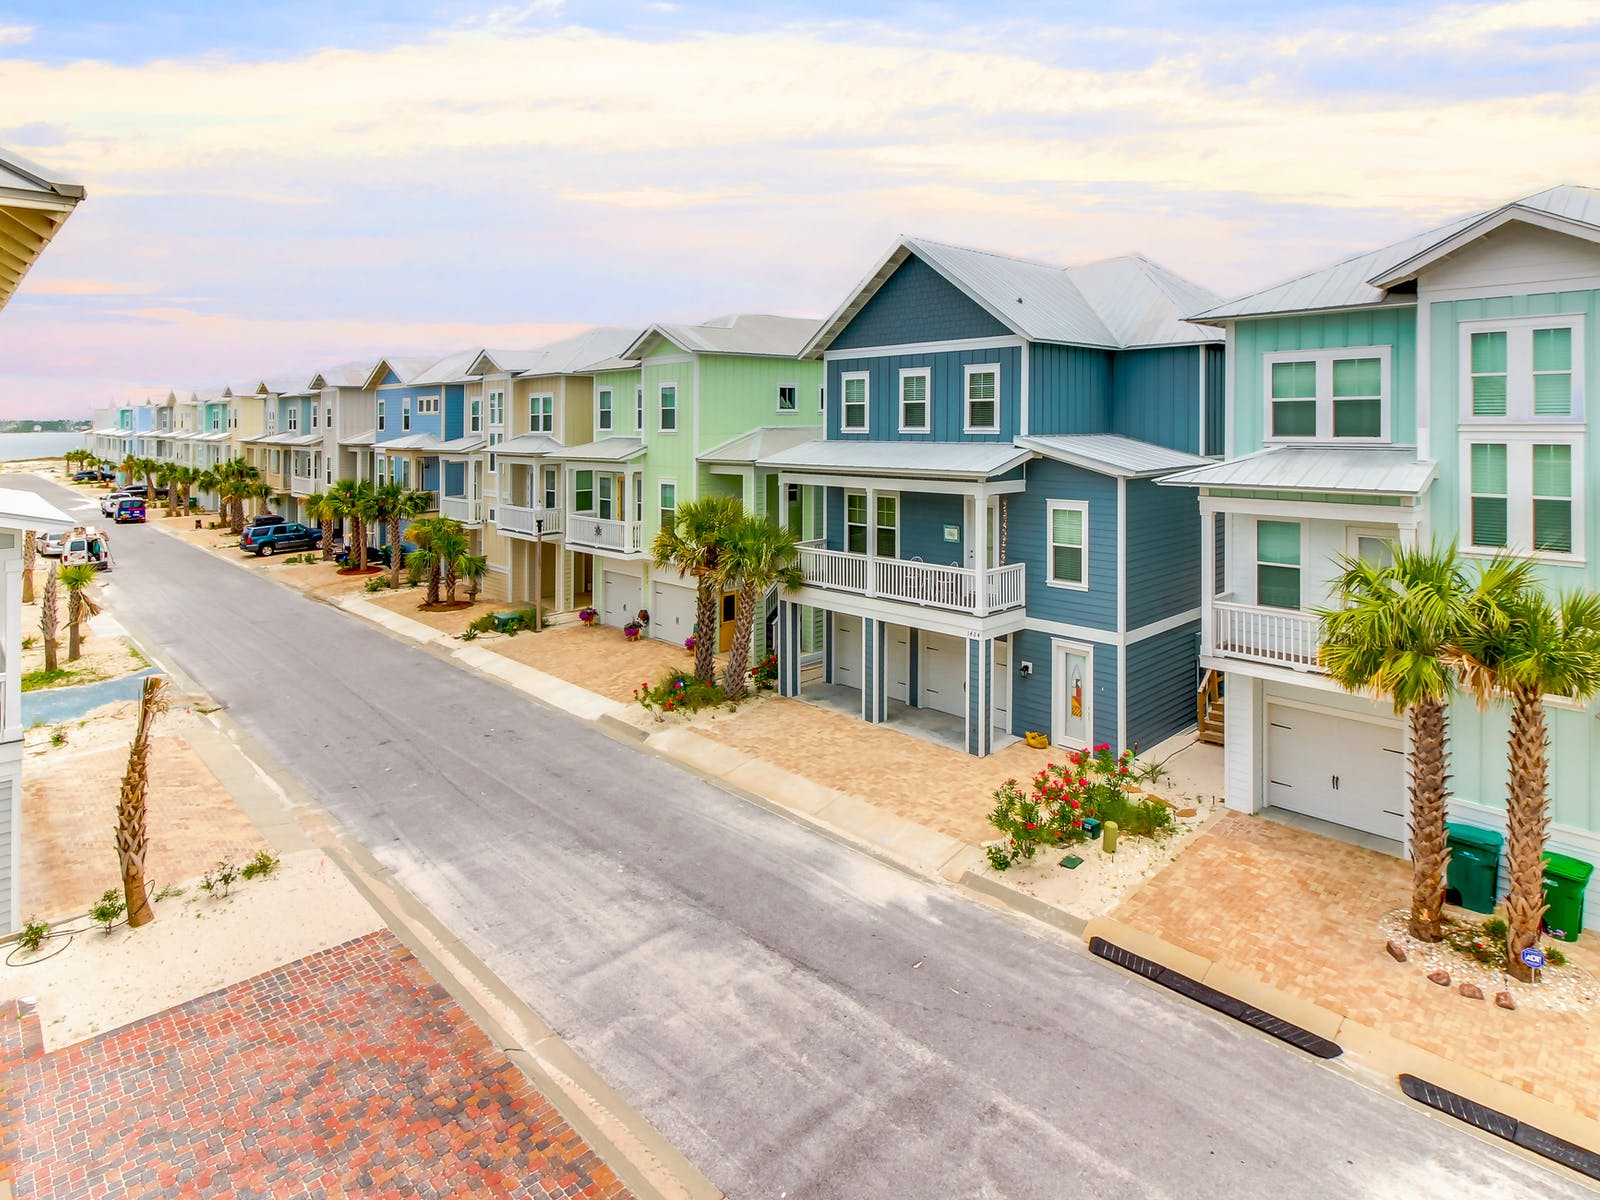 row of beach houses in Navarre Beach, FL